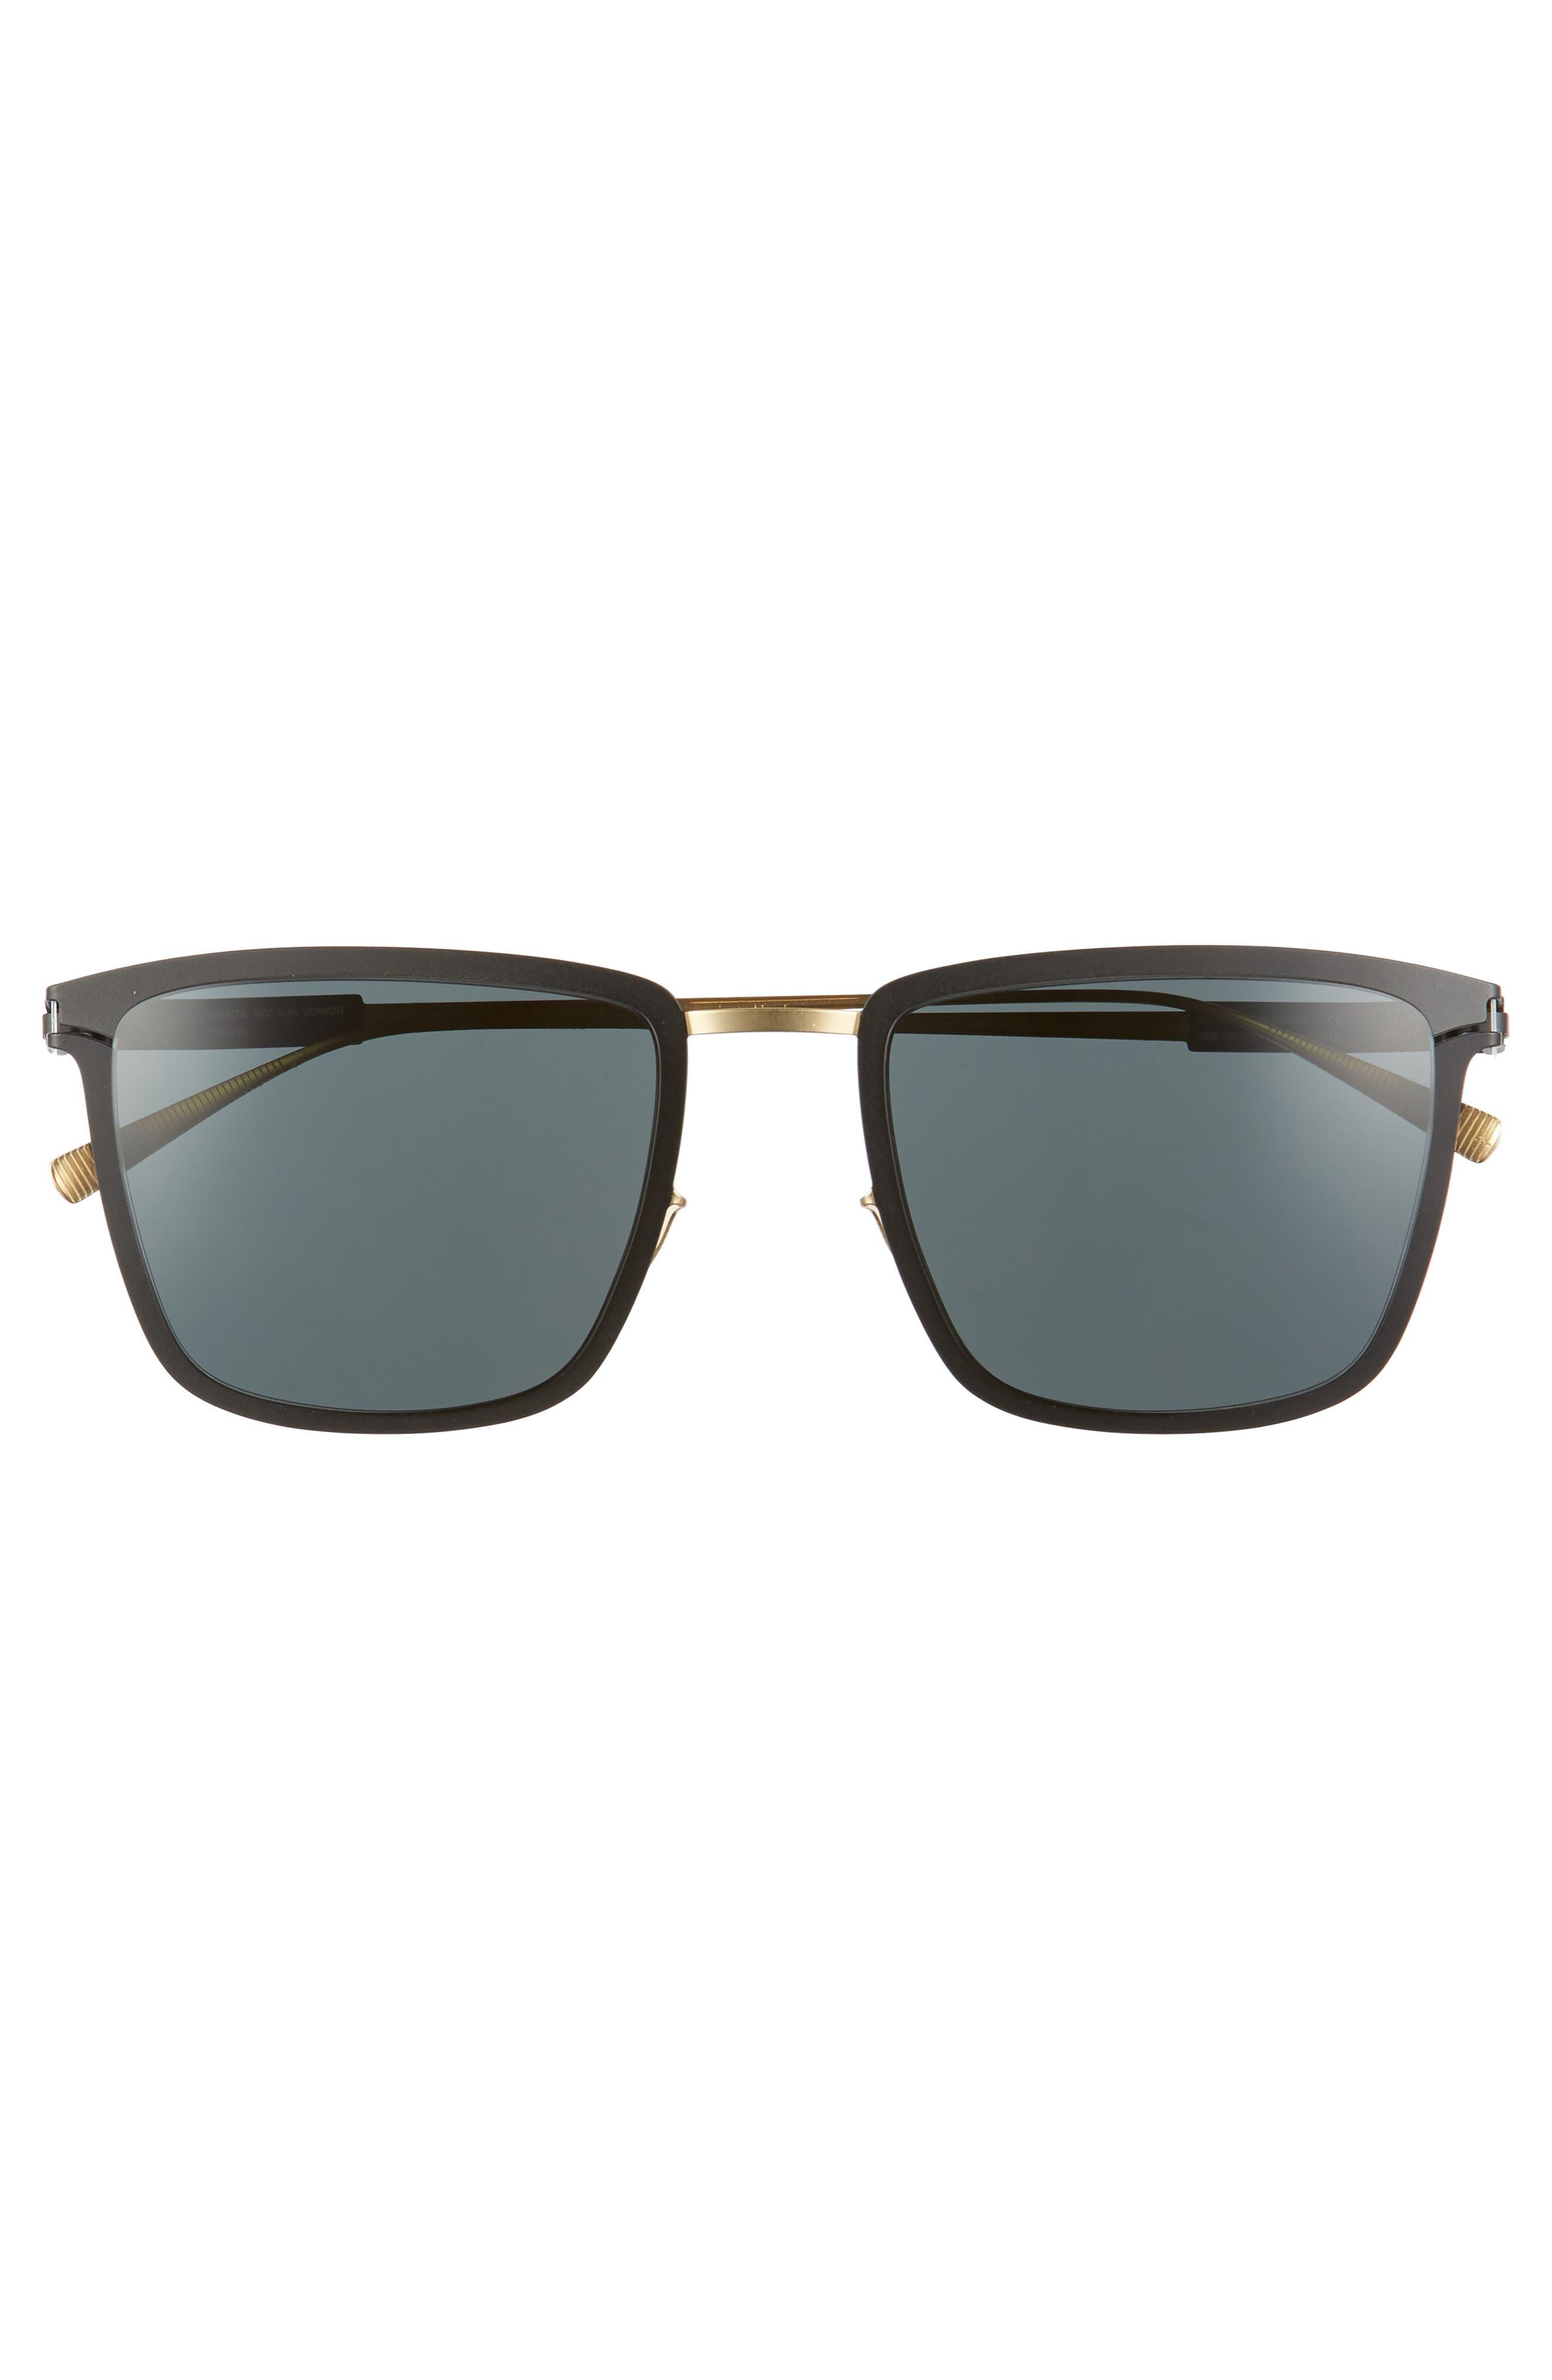 Vernon 54mm Polarized Sunglasses,                             Alternate thumbnail 2, color,                             Gold/ Black